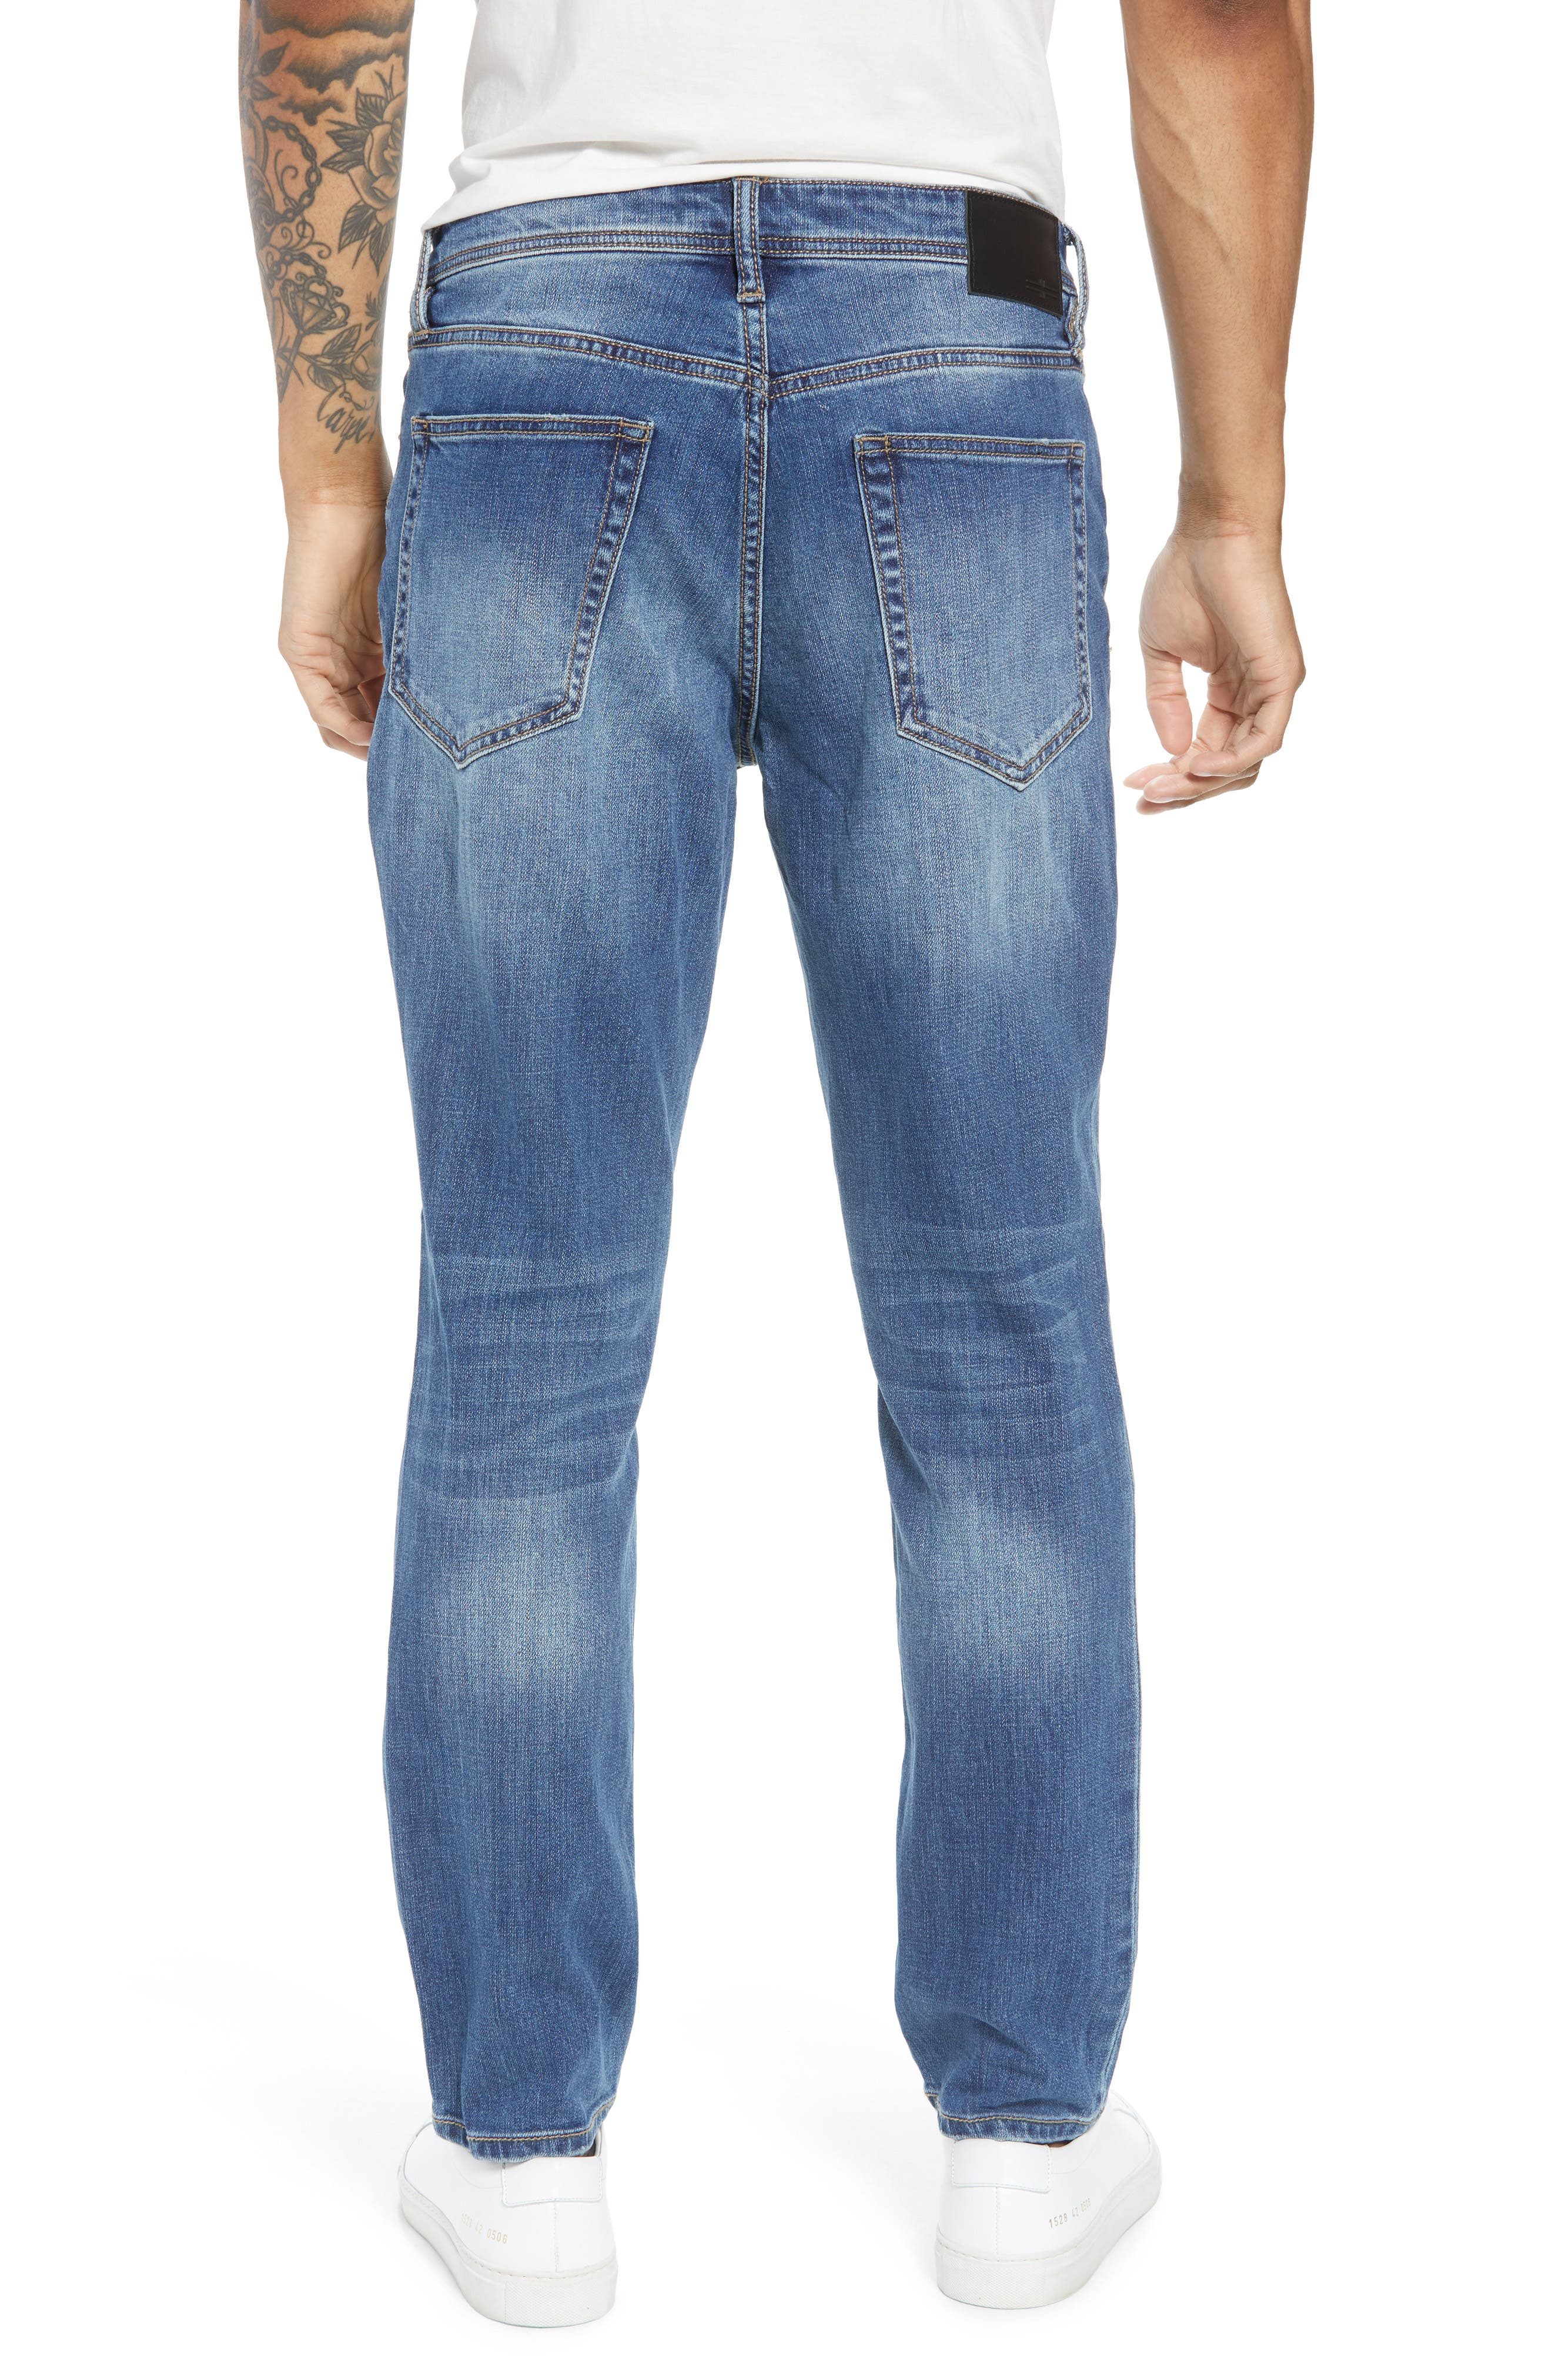 Jeans Co. Slim Straight Leg Jeans,                             Alternate thumbnail 2, color,                             BRYSON VINTAGE MED